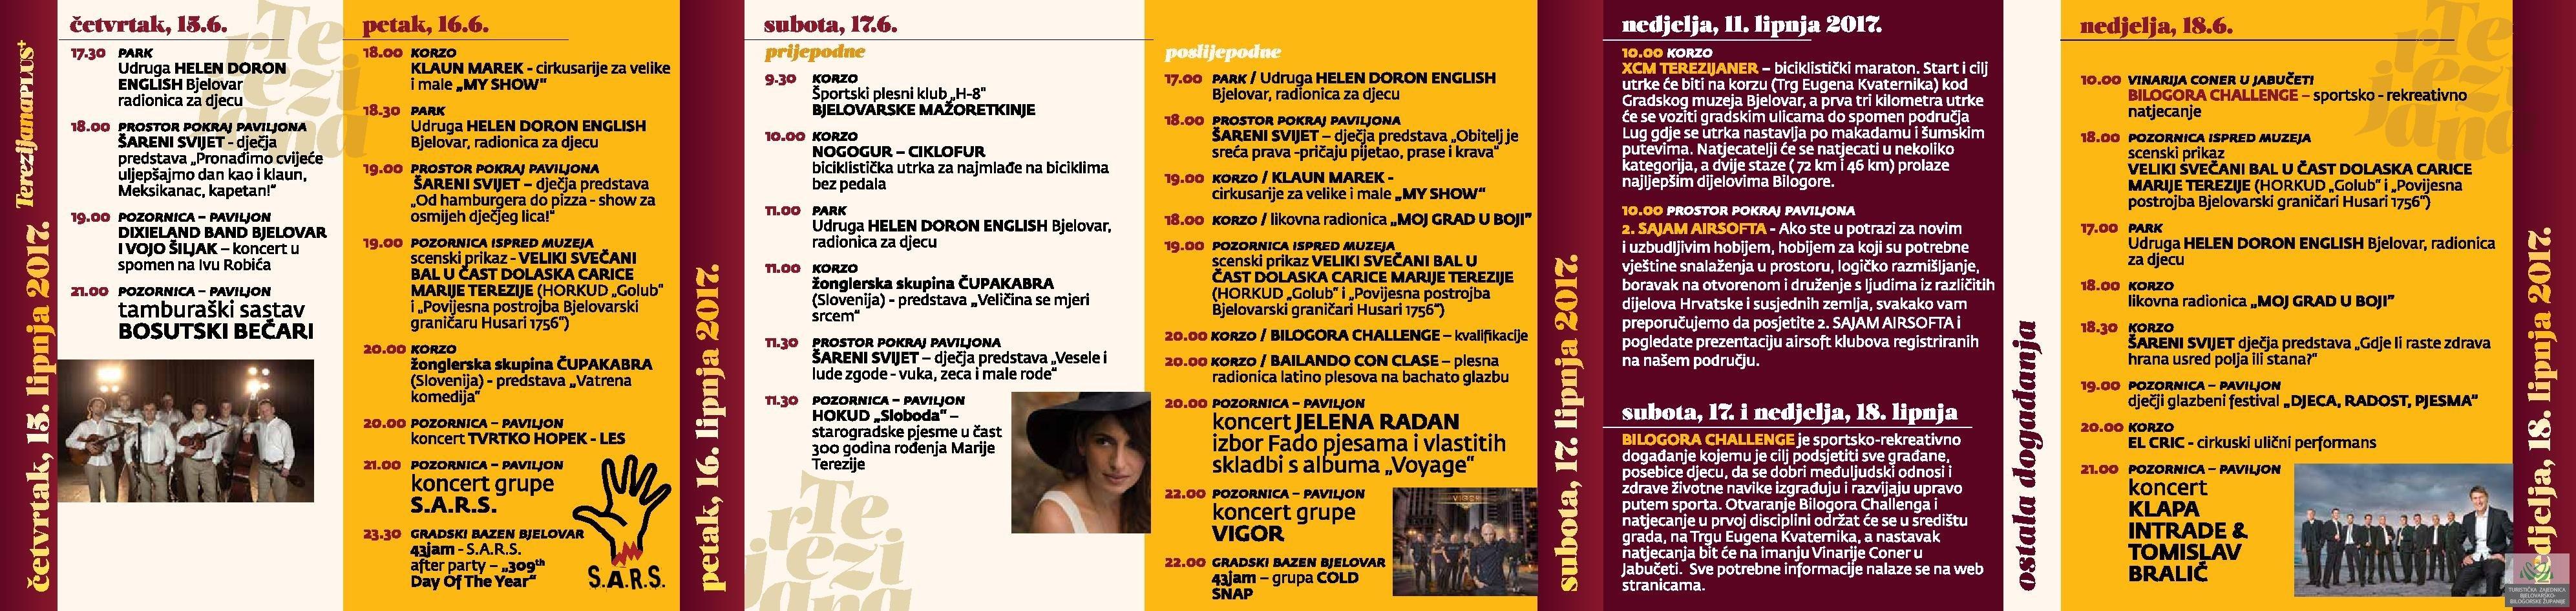 Terezijana 2017. - Program